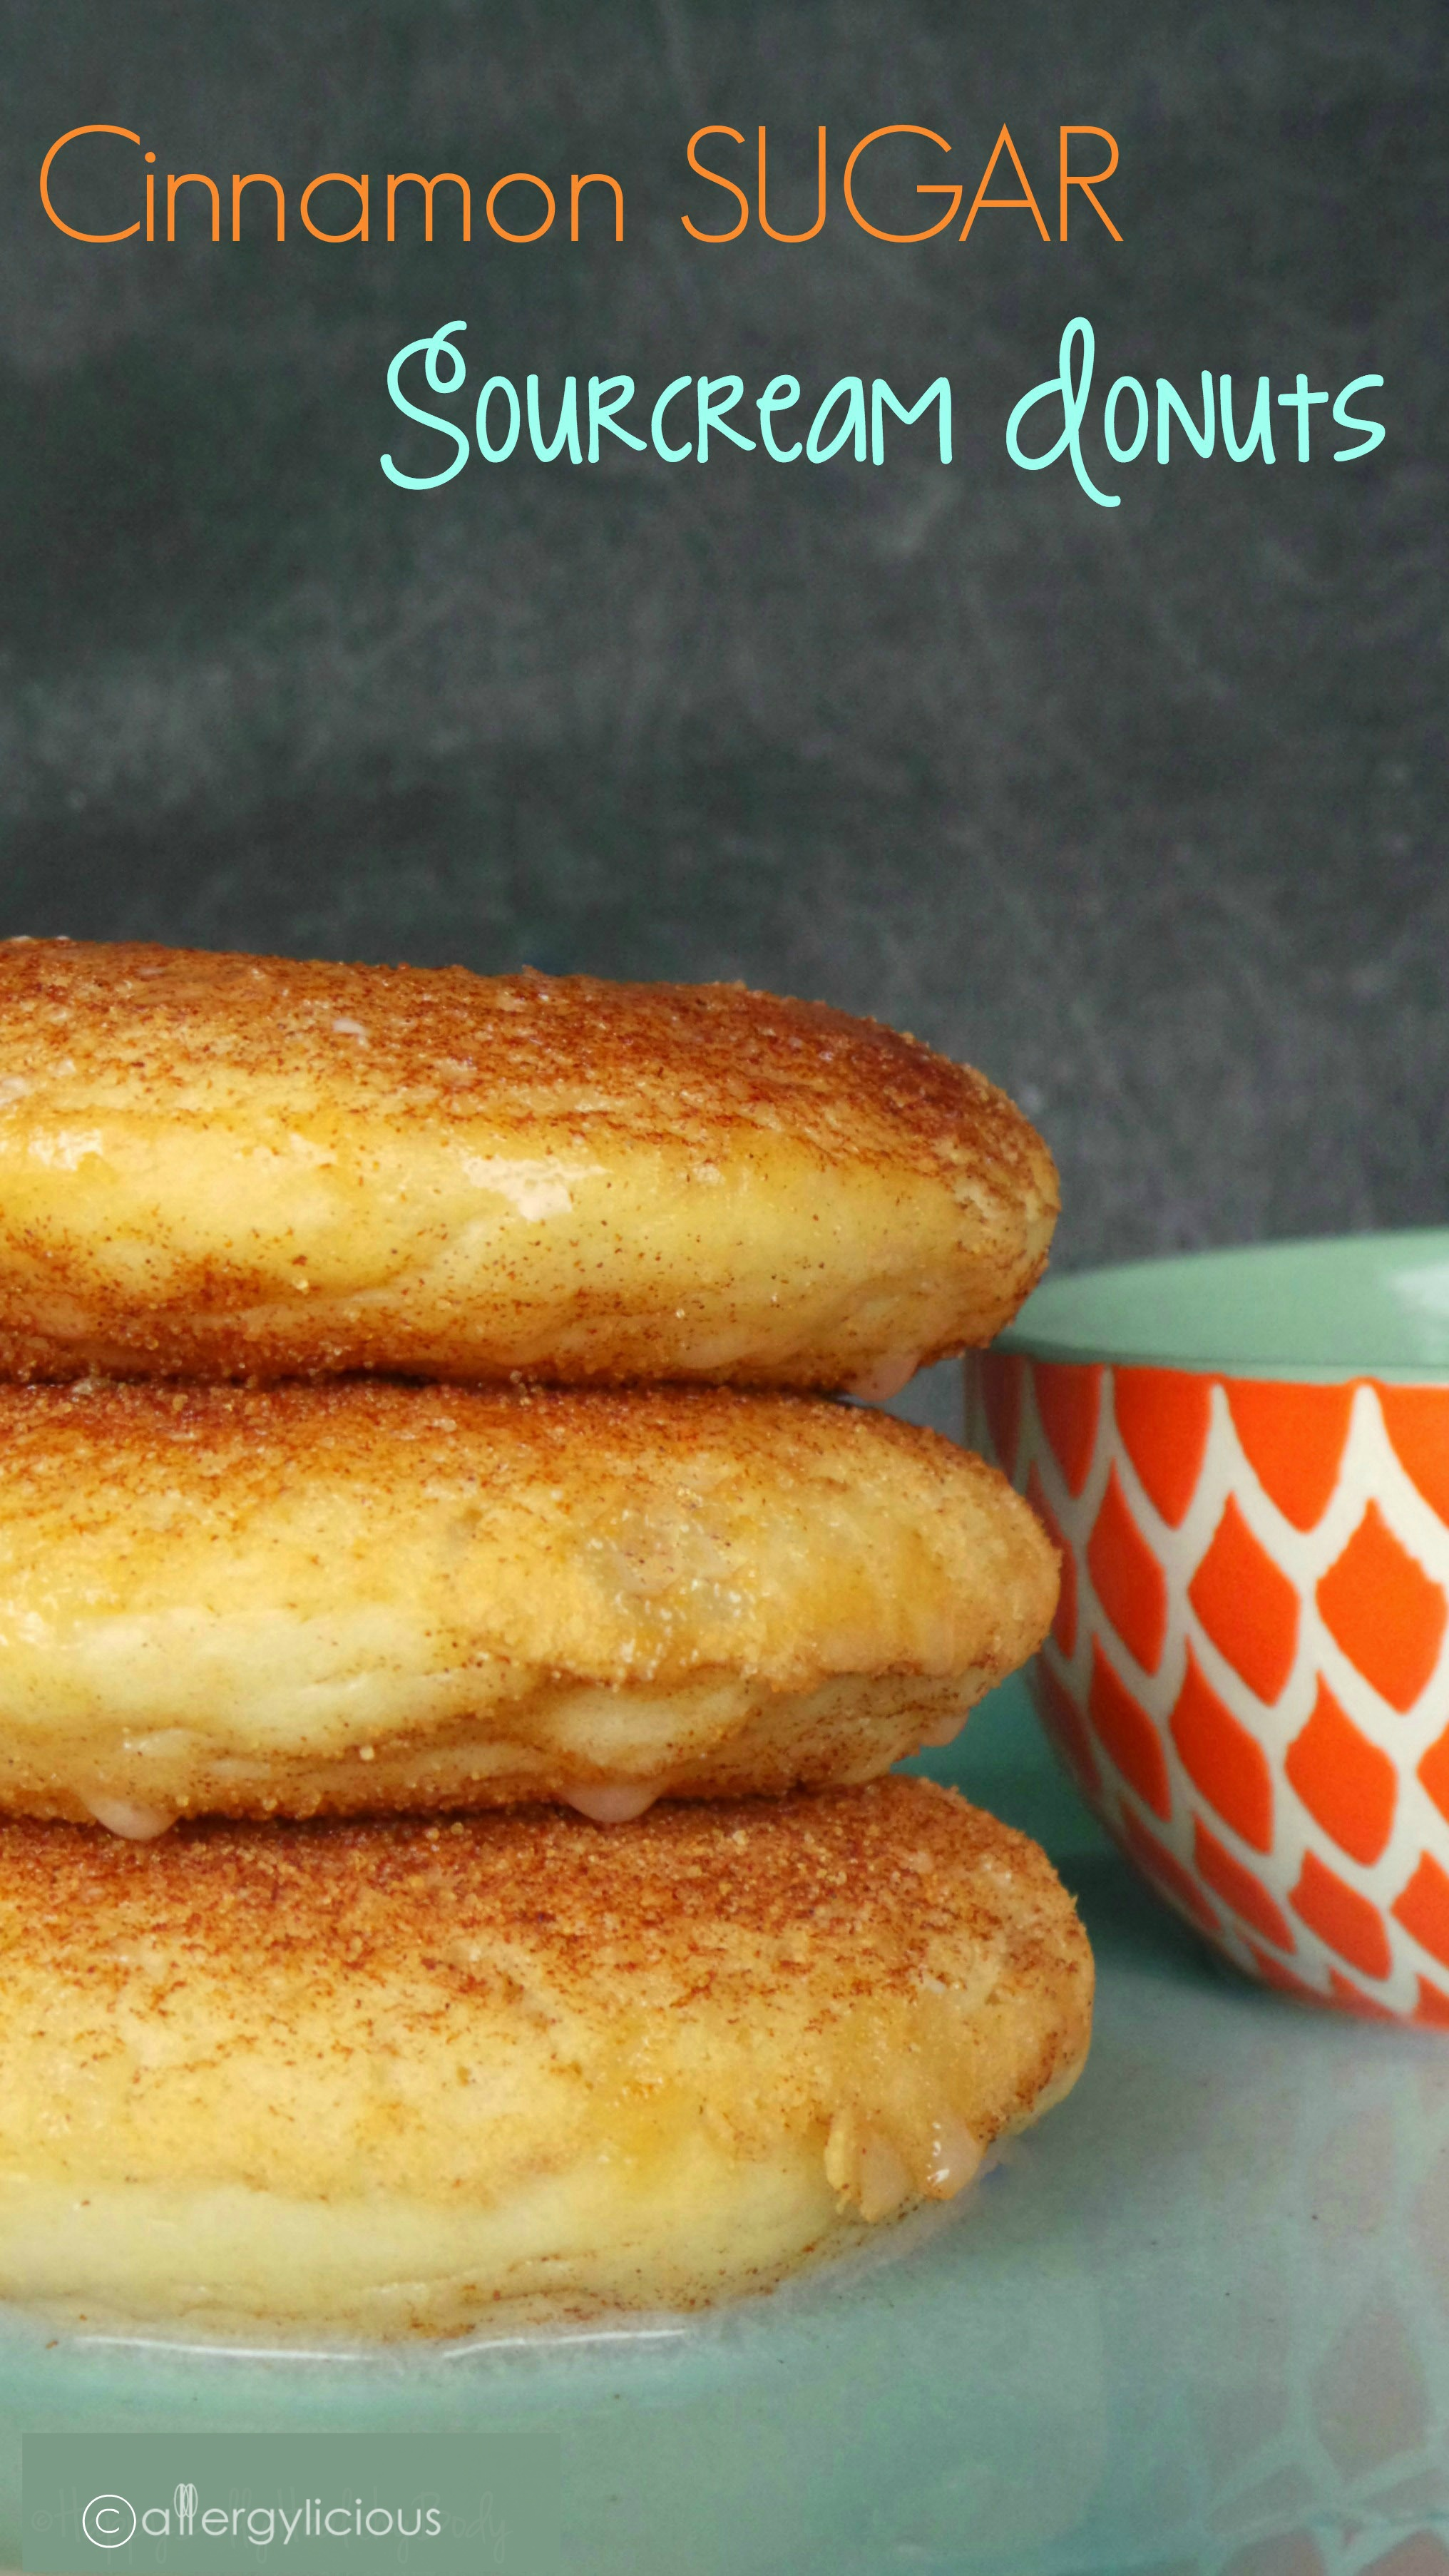 Easy, delicious, bakery-style cinnamon sugar donuts. Vegan & allergy-friendly